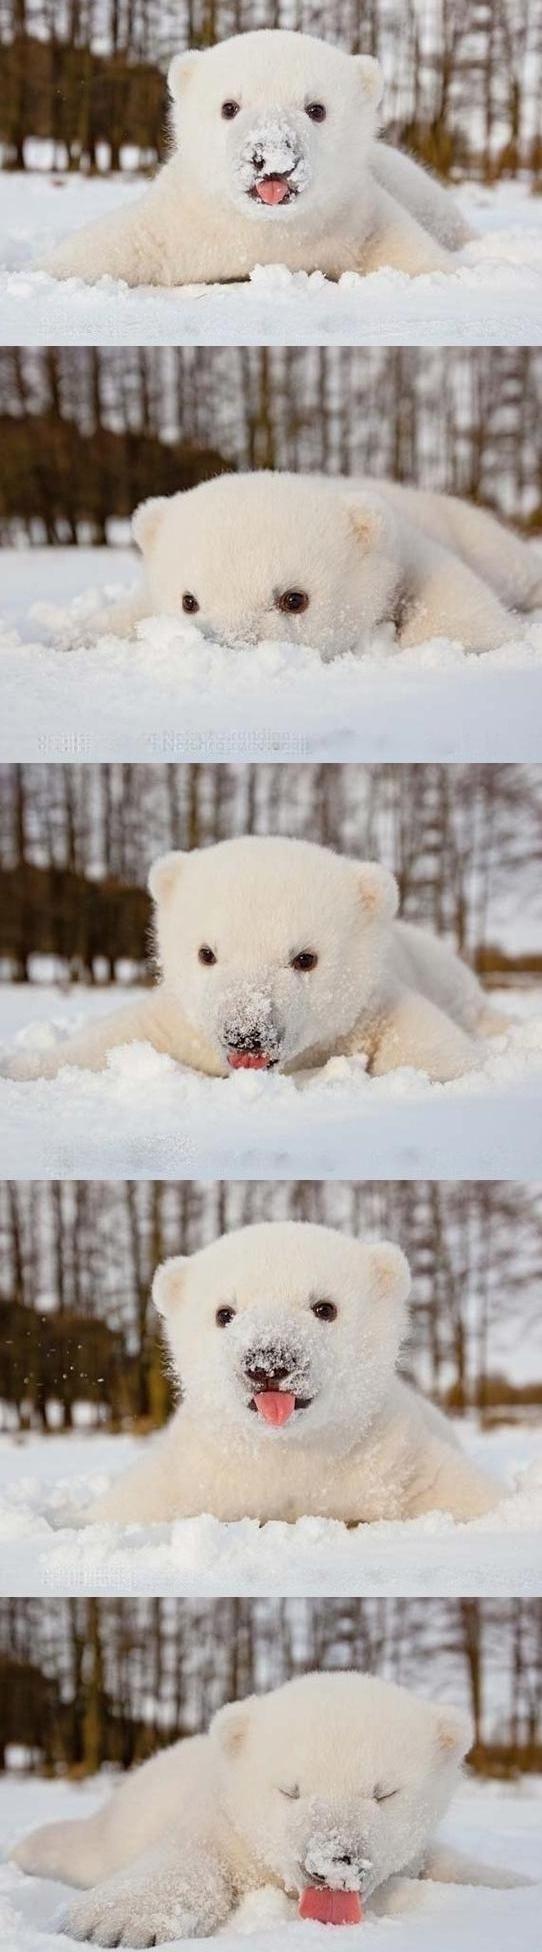 Baby polar bears.